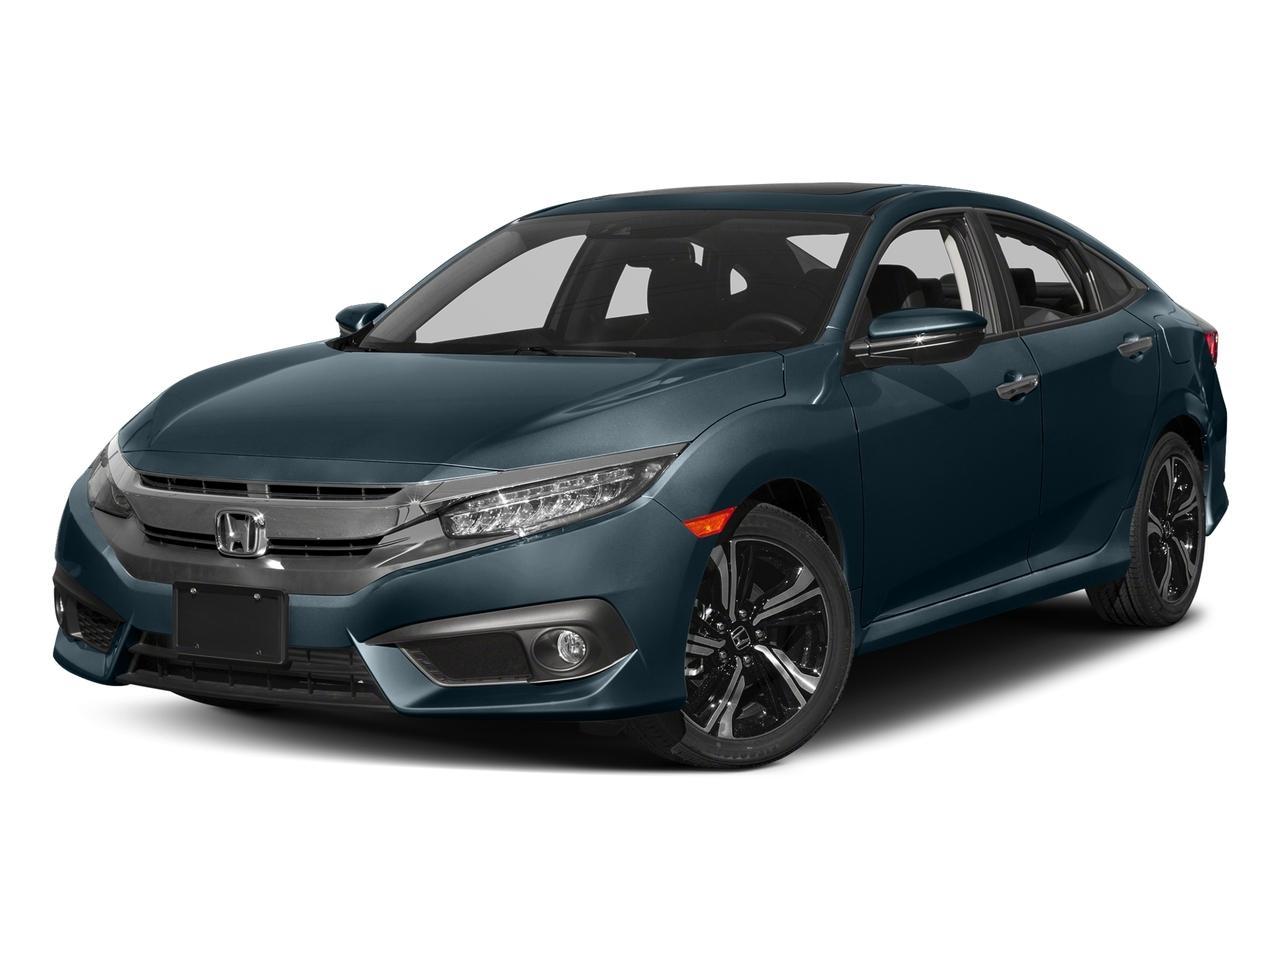 2017 Honda Civic Sedan Vehicle Photo in Killeen, TX 76541